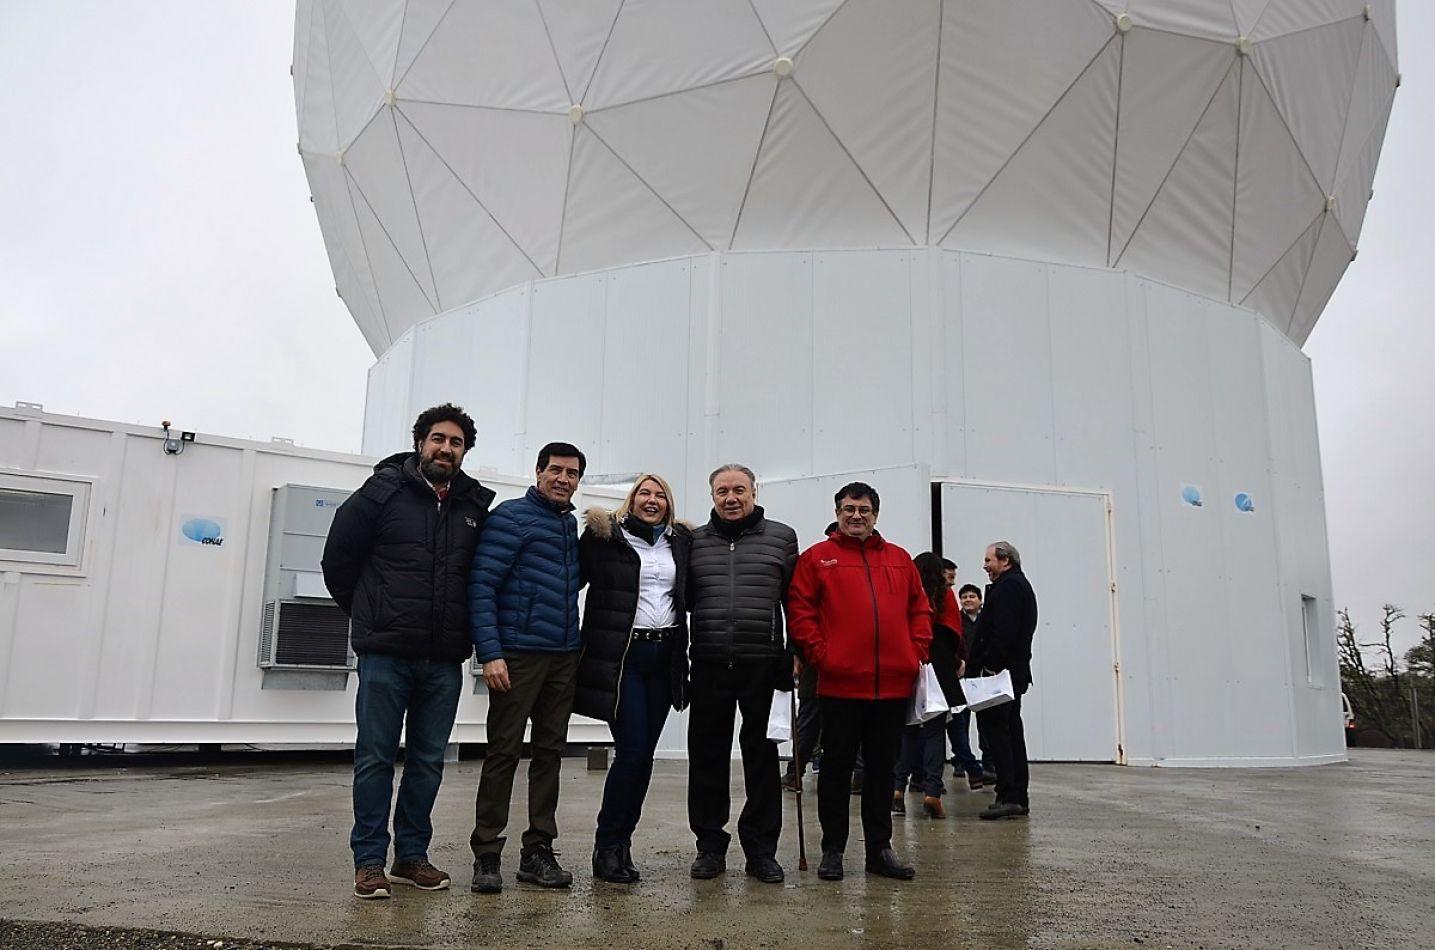 La gobernadora Rosana Bertone, junto a autoridades de la FRTDF UTN en la estación terrena satelital.